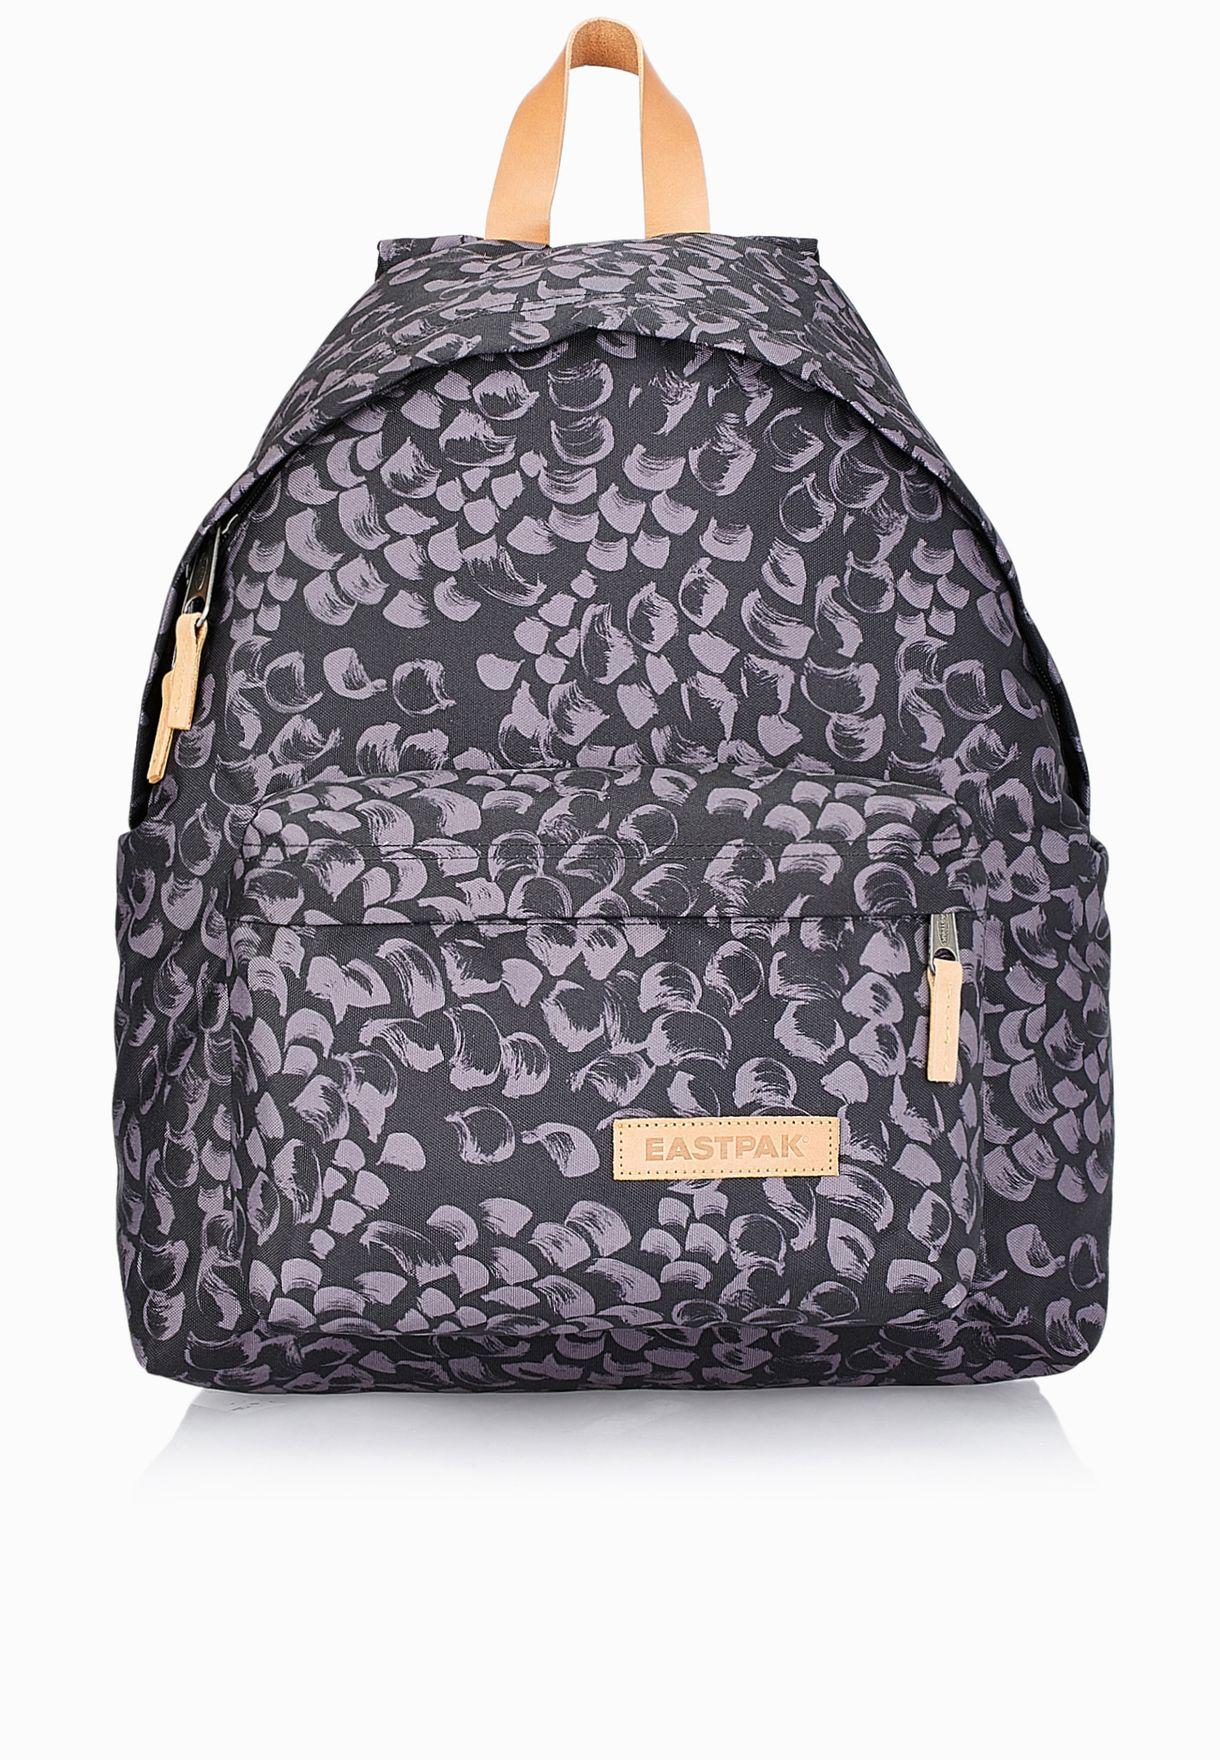 Padded Eastpak Pak'r Men In Prints Ek62049m Shop Backpack For w6qCTO